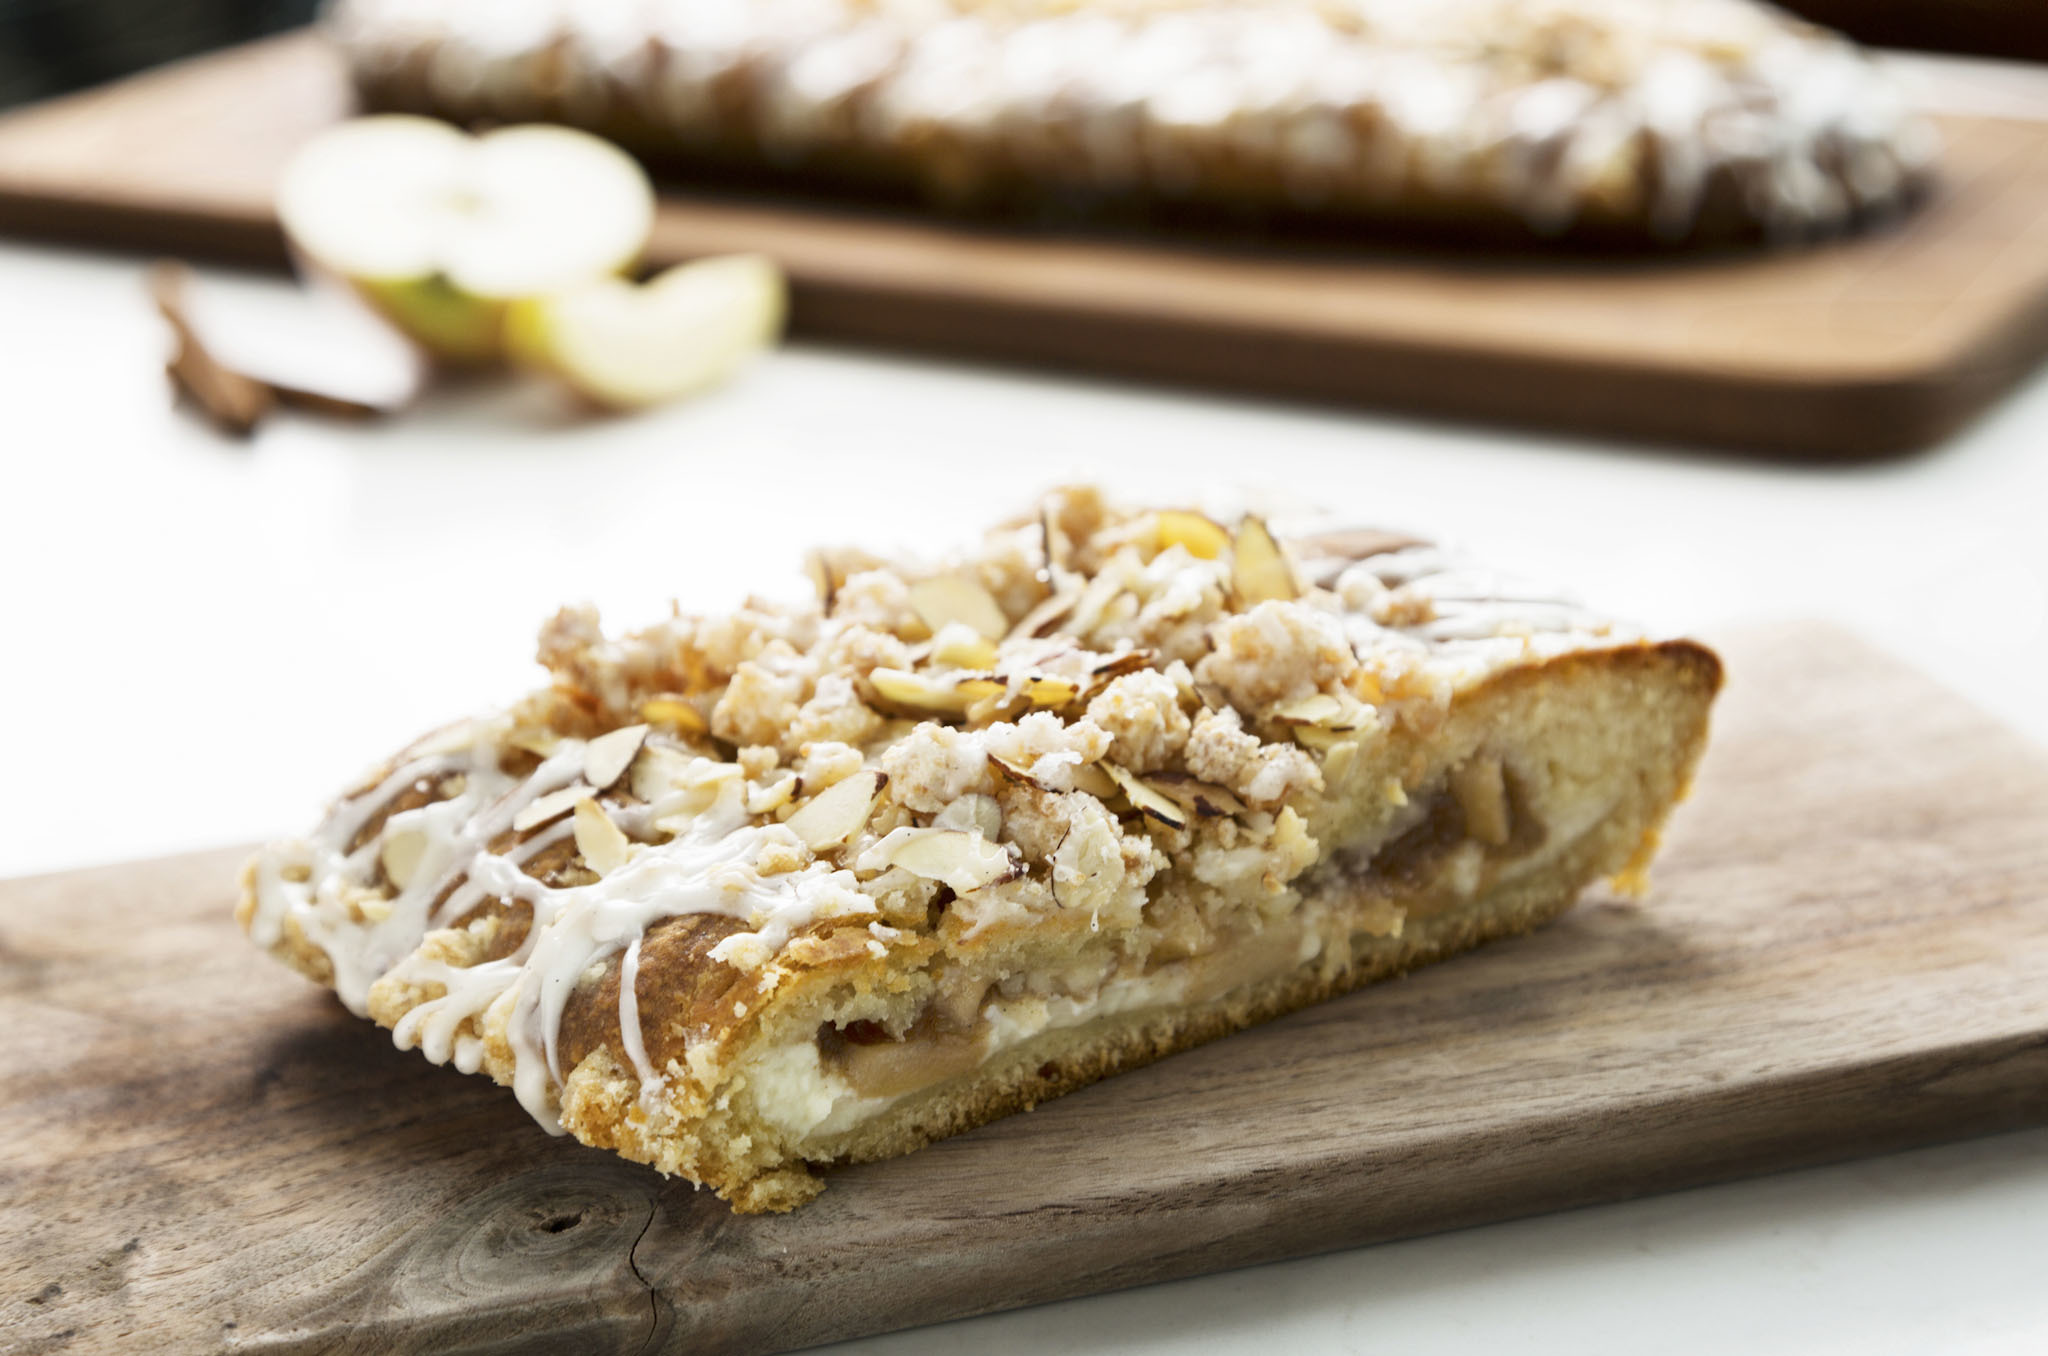 Apple cream cheese Danish at GreenRiver